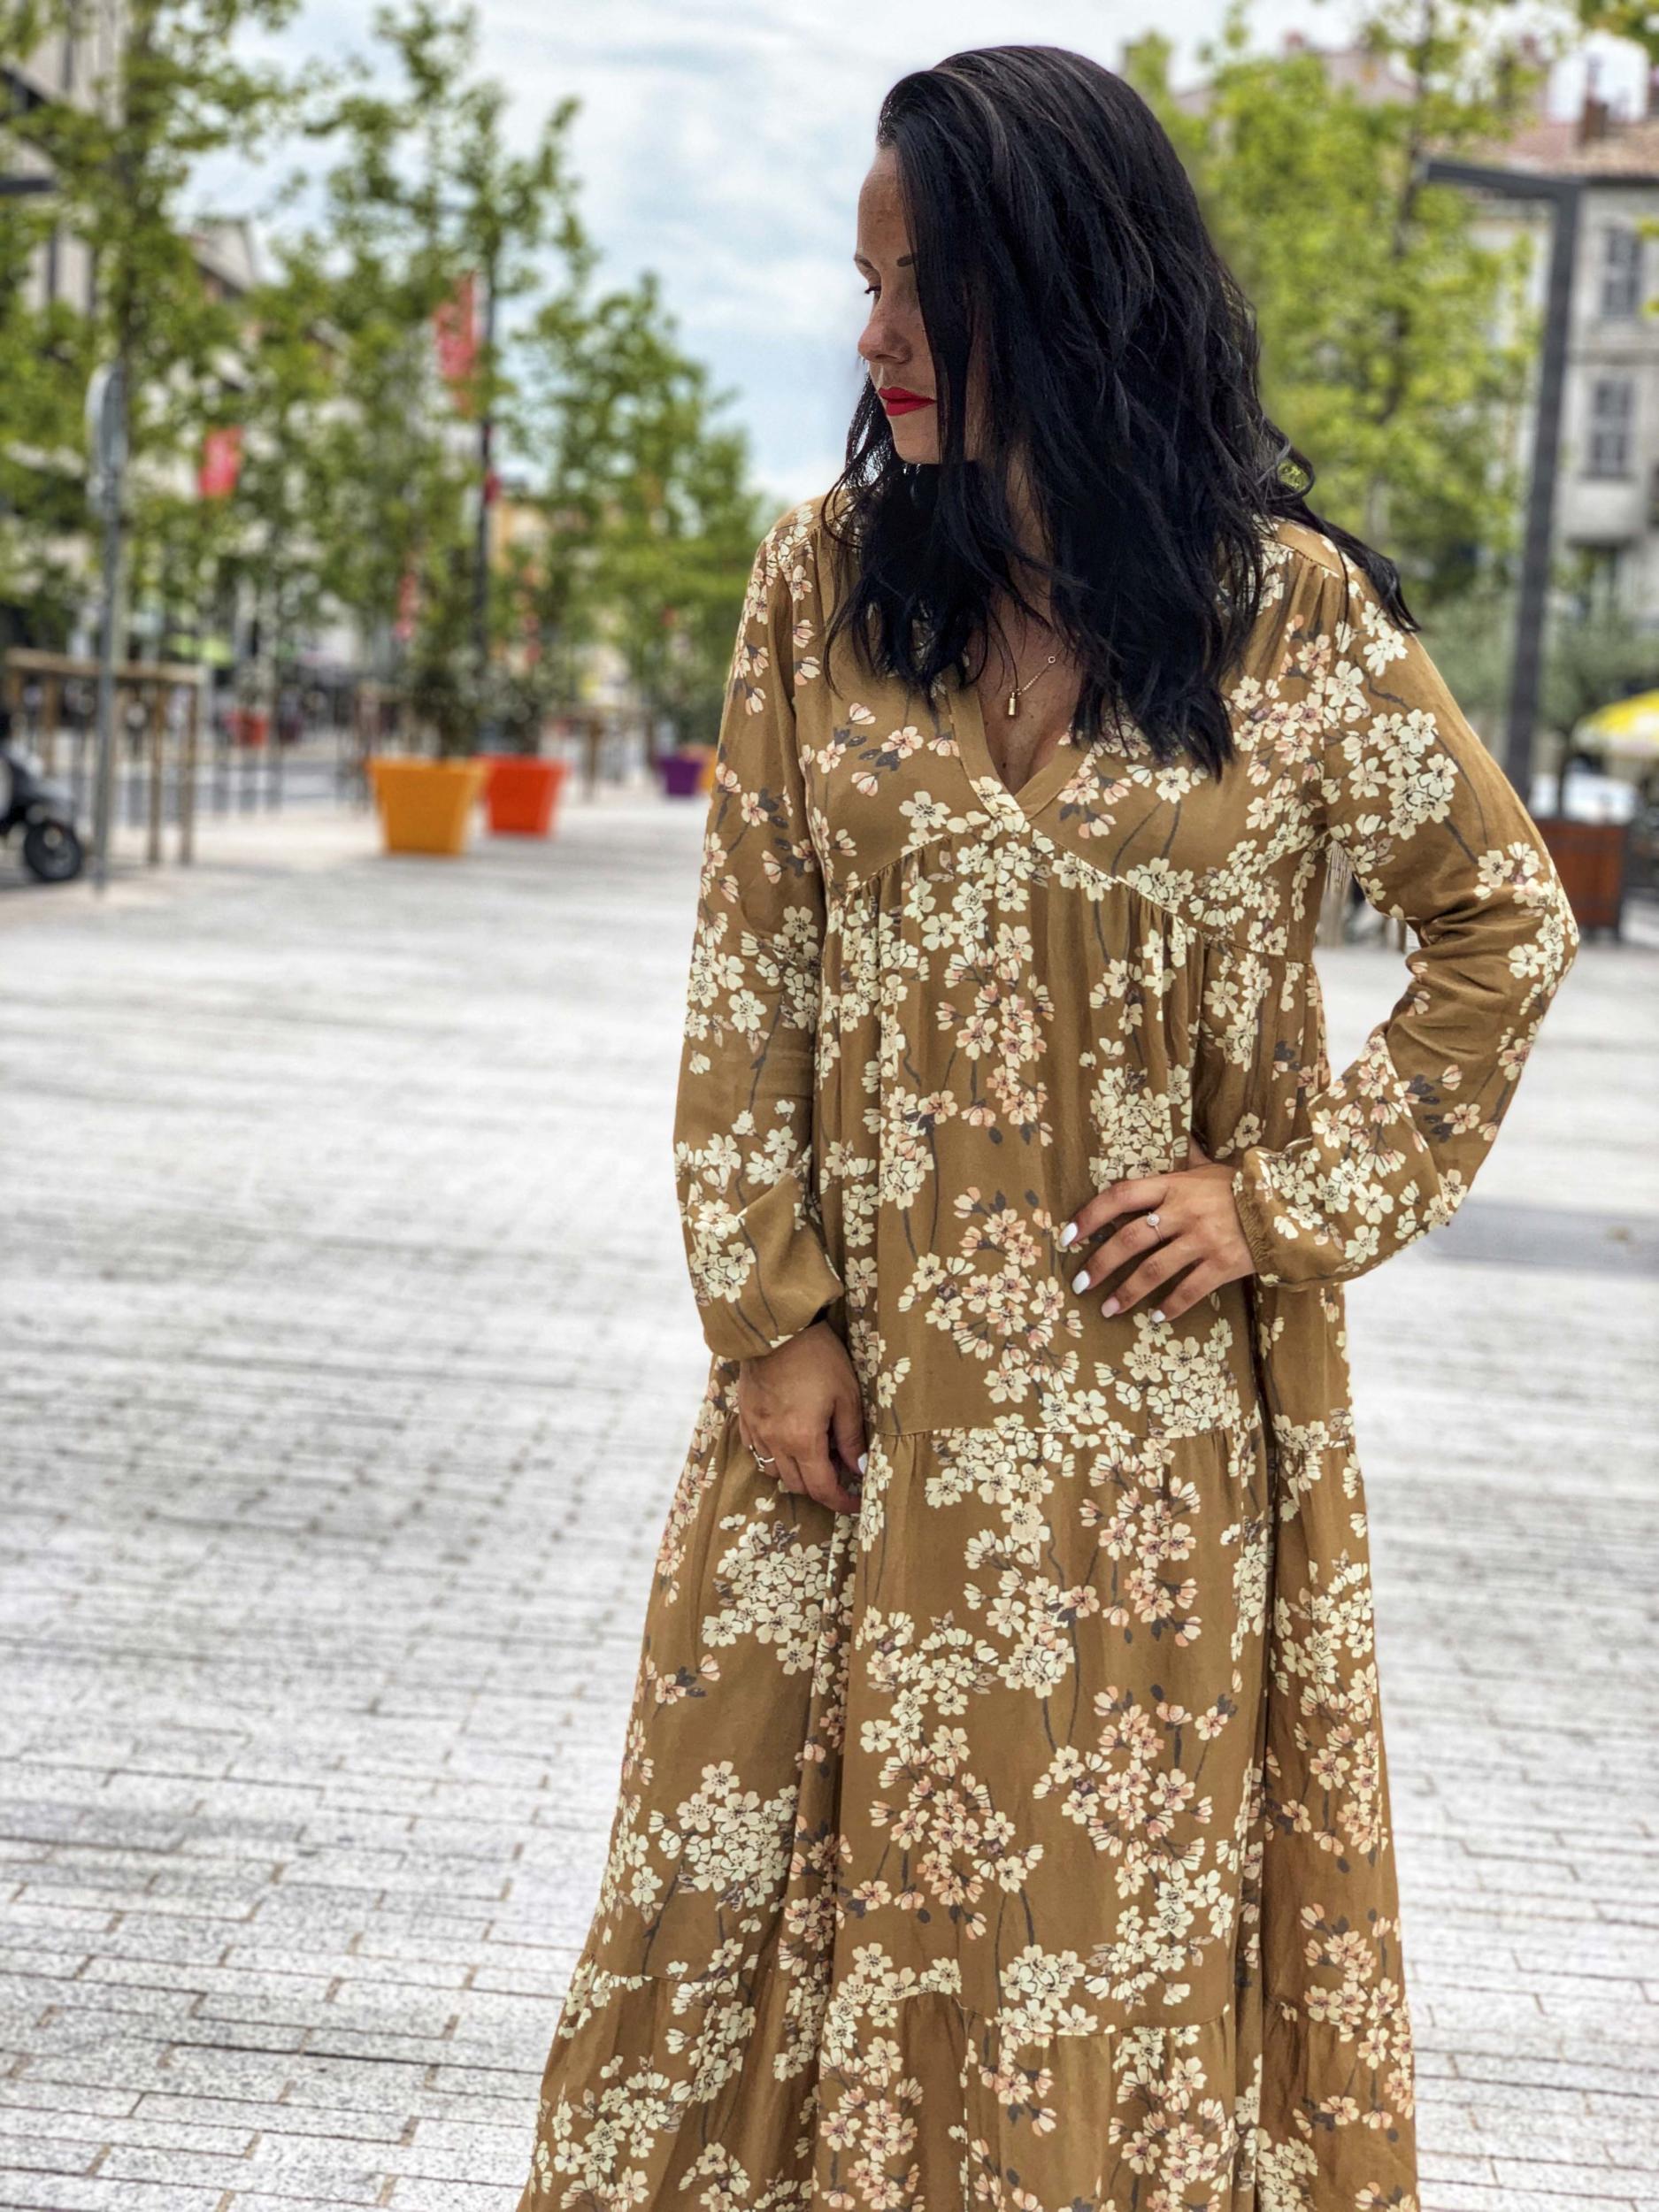 robe boheme chic beige et camel